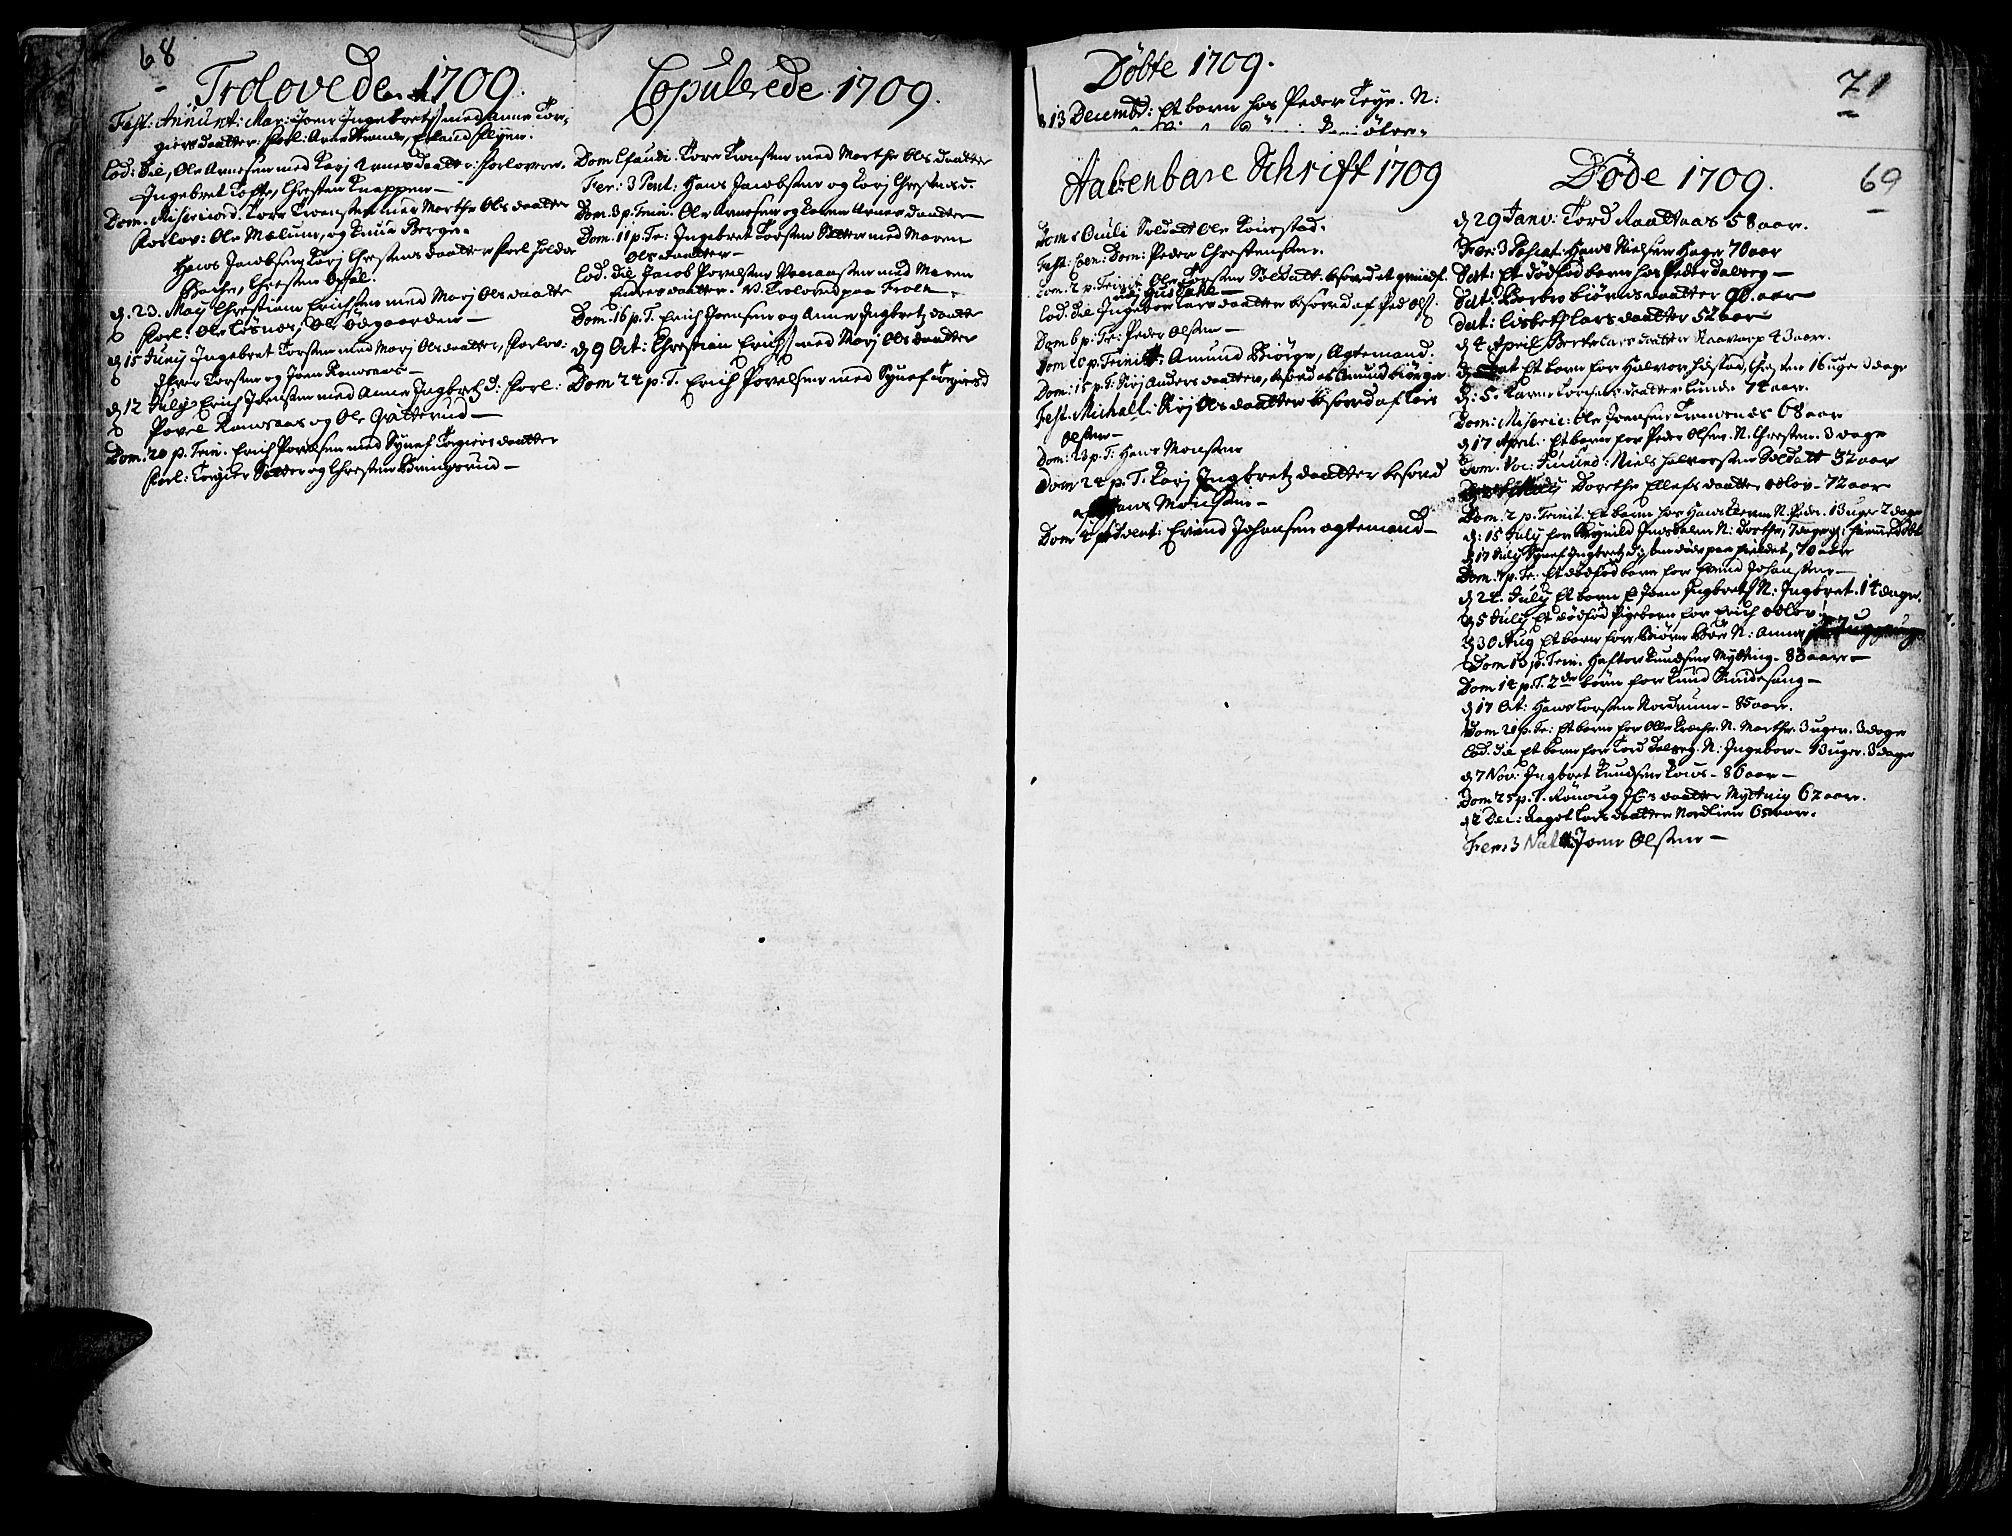 SAH, Ringebu prestekontor, Ministerialbok nr. 1, 1696-1733, s. 68-69